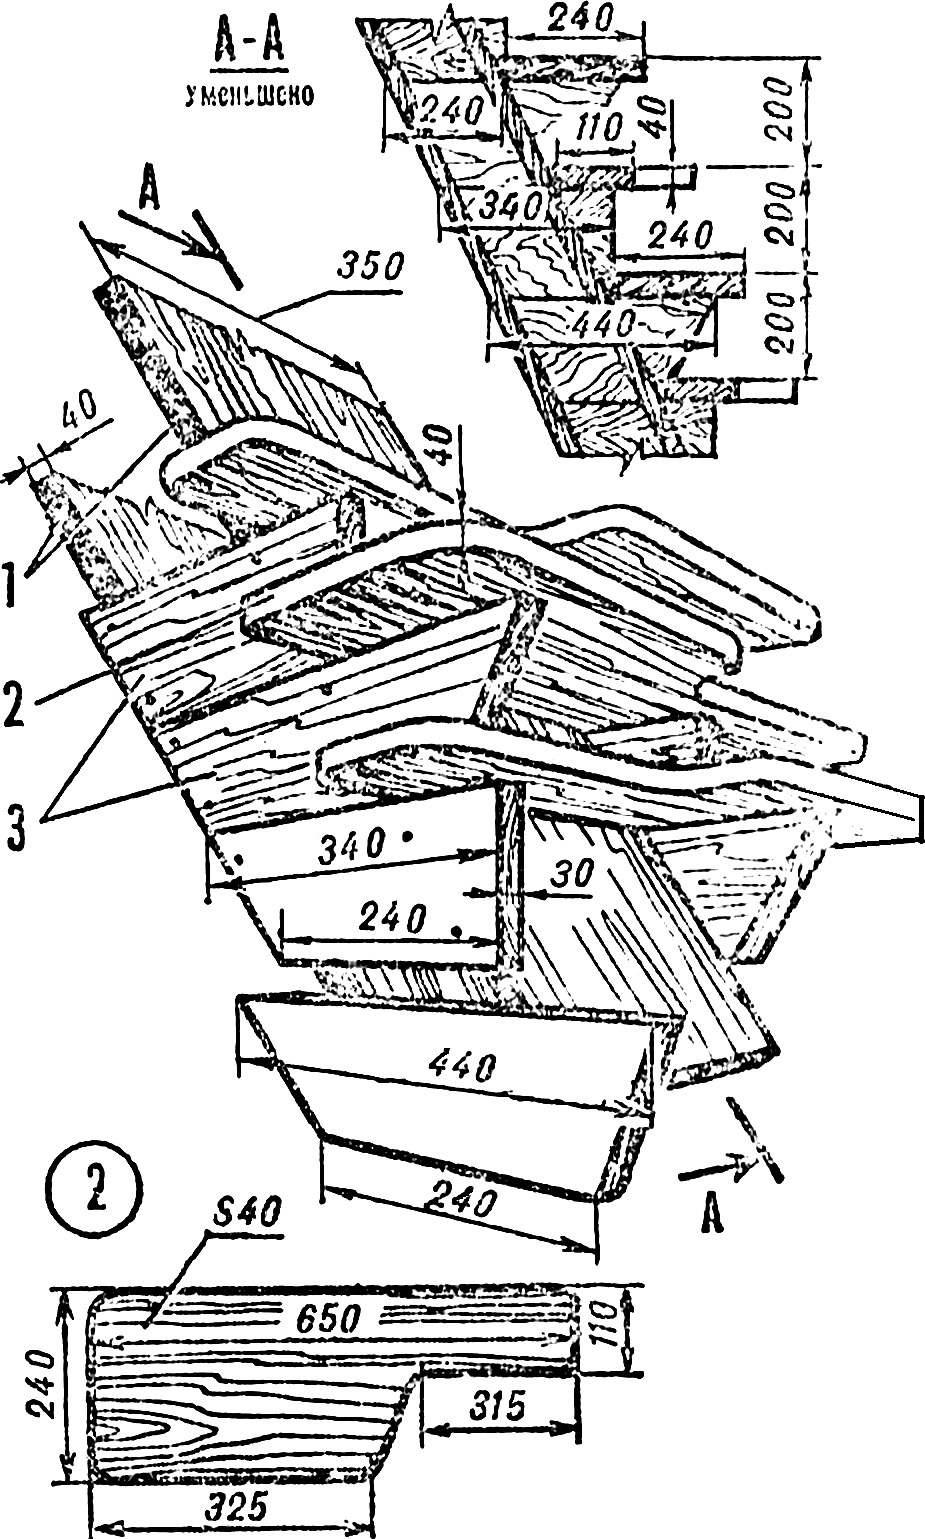 Рис. 3. Одномаршевая лестница коробчатого типа и ее элементы.